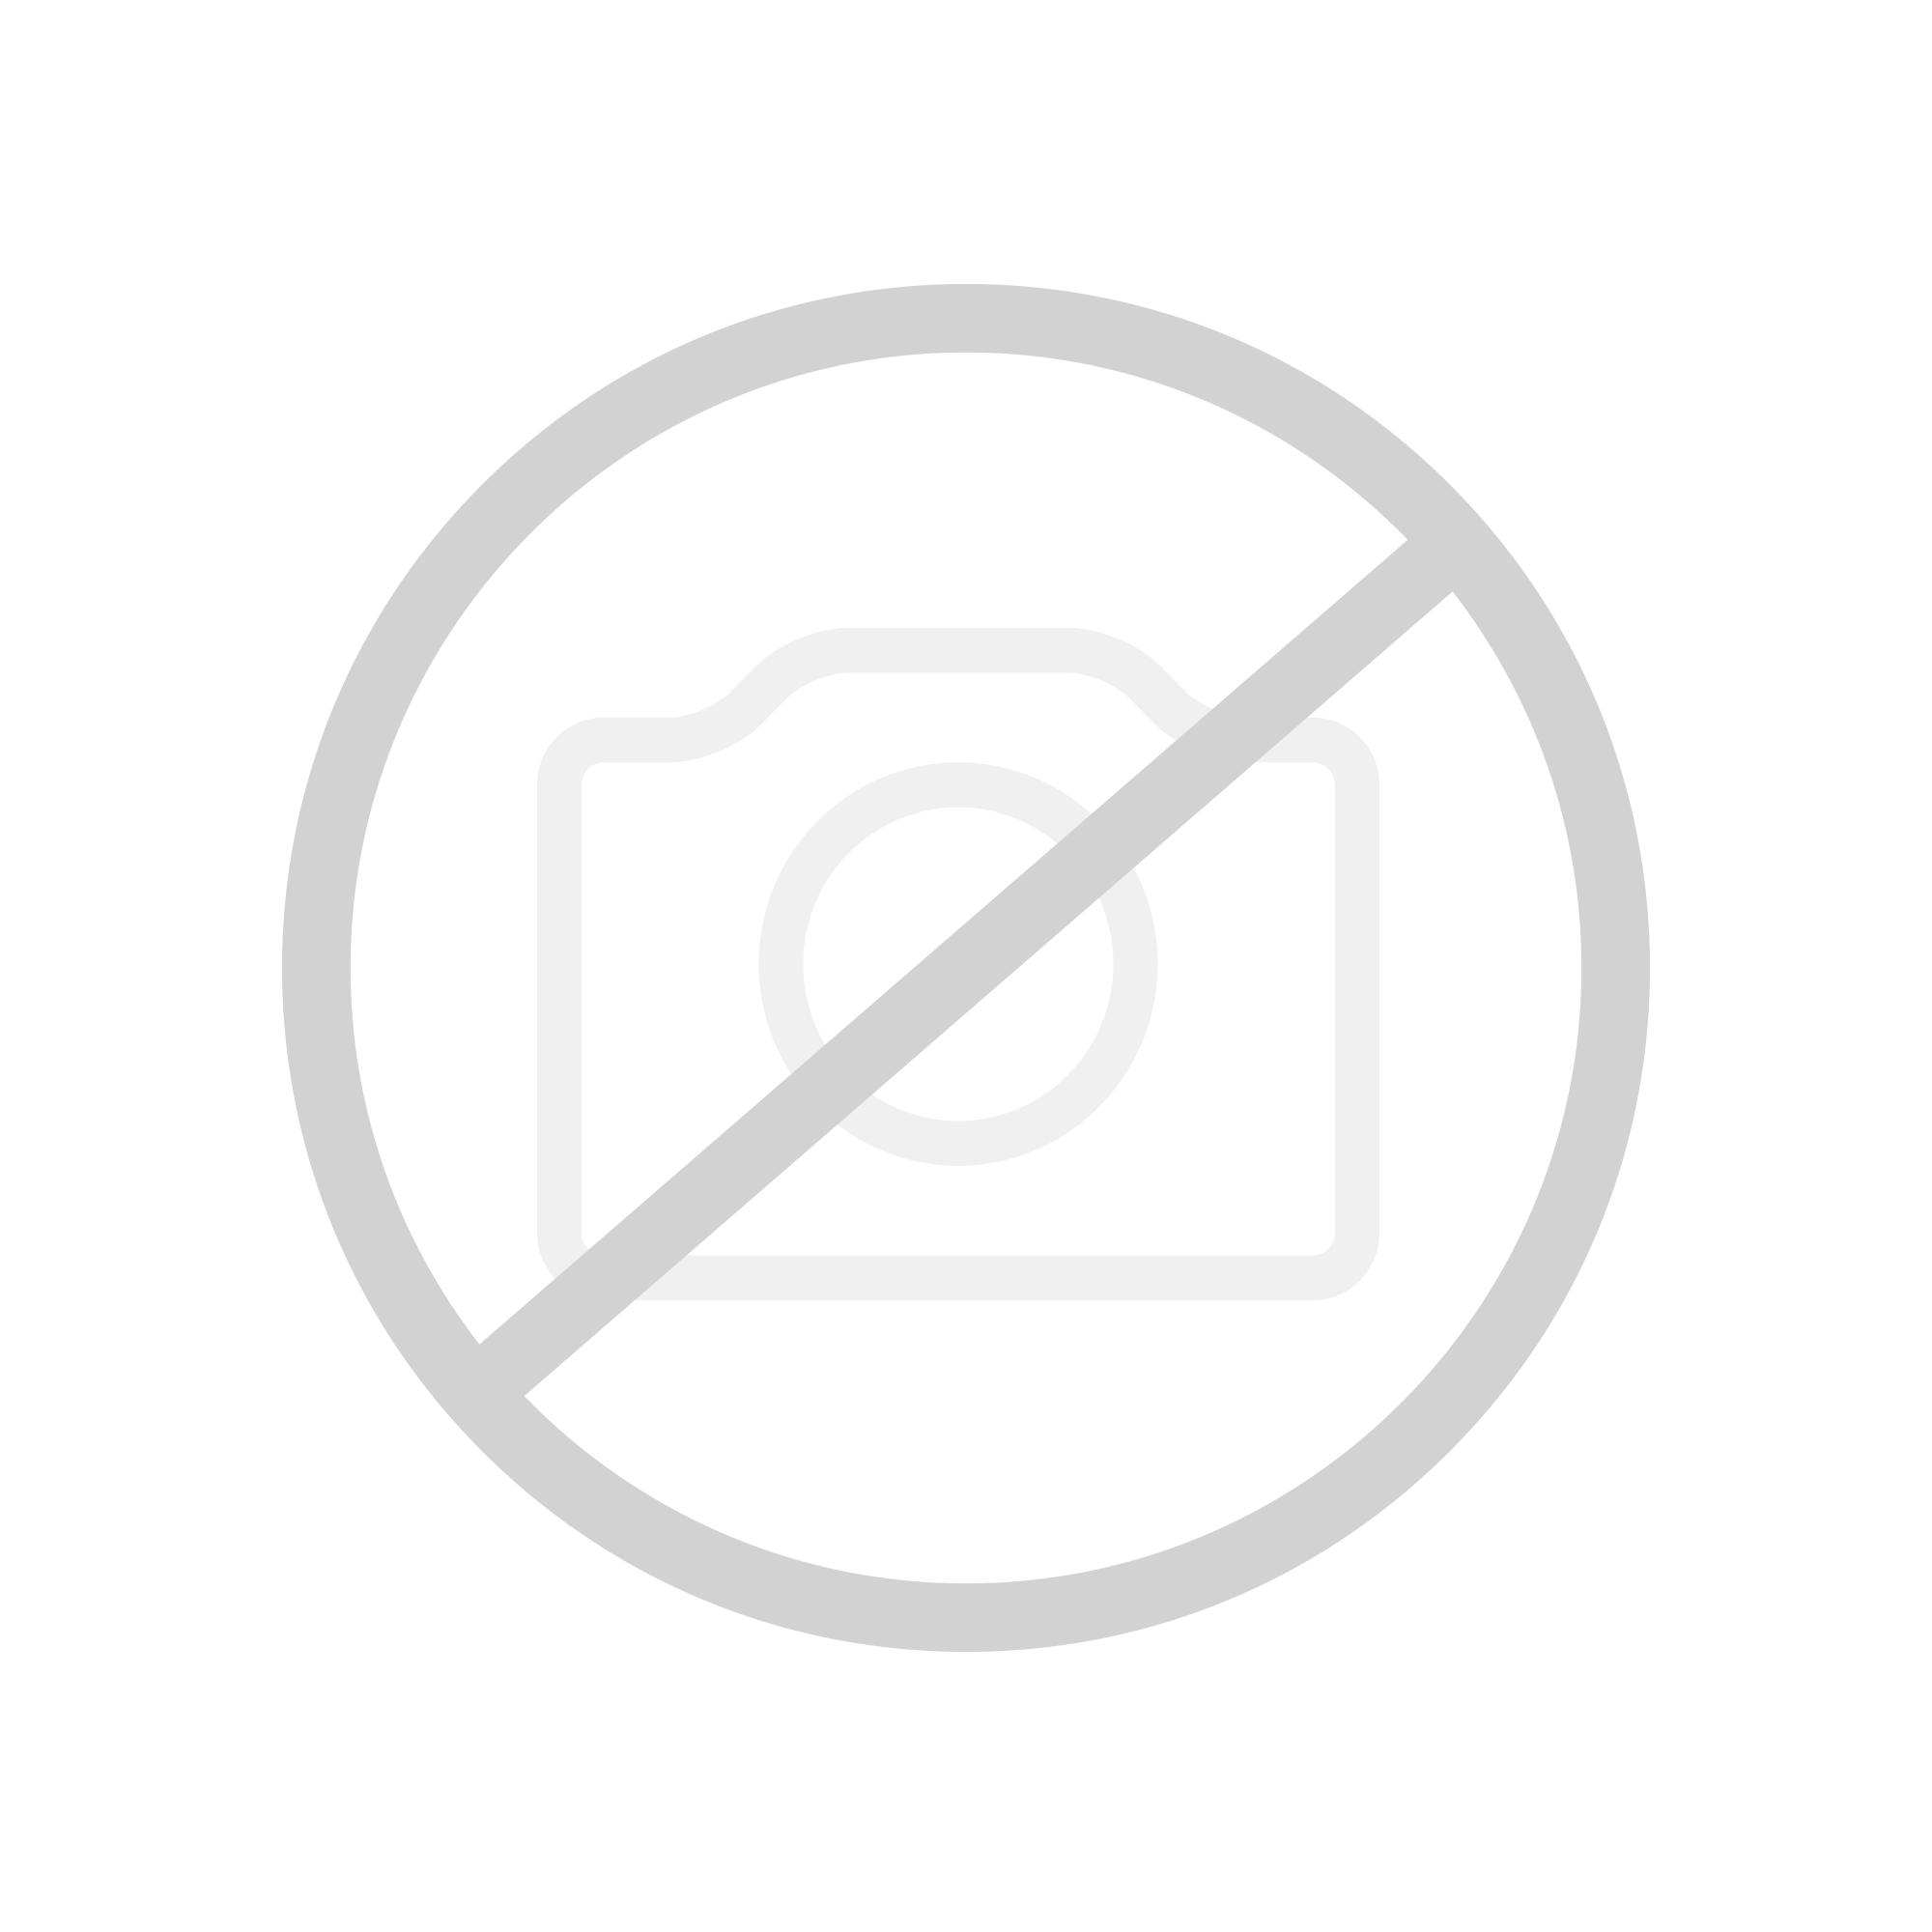 Geberit Setaplano Rechteck-Duschwanne - 154270111 | REUTER | {Duschwanne 62}